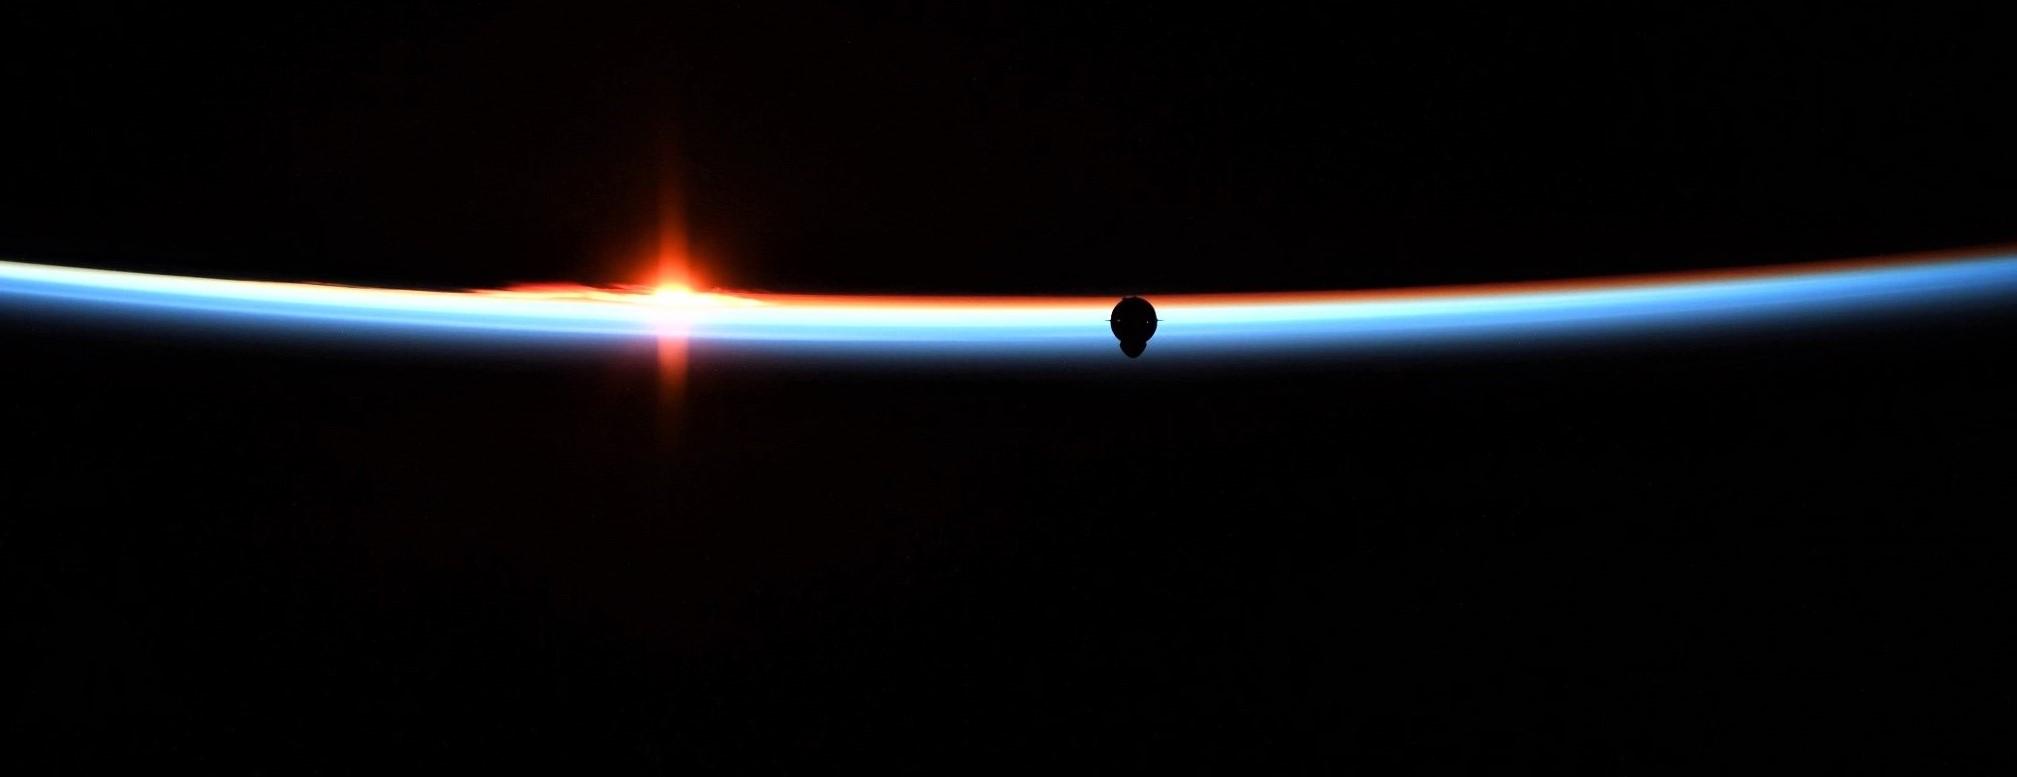 Crew Dragon DM-1 ISS arrival 030319 (Anne McClain) 1 edit